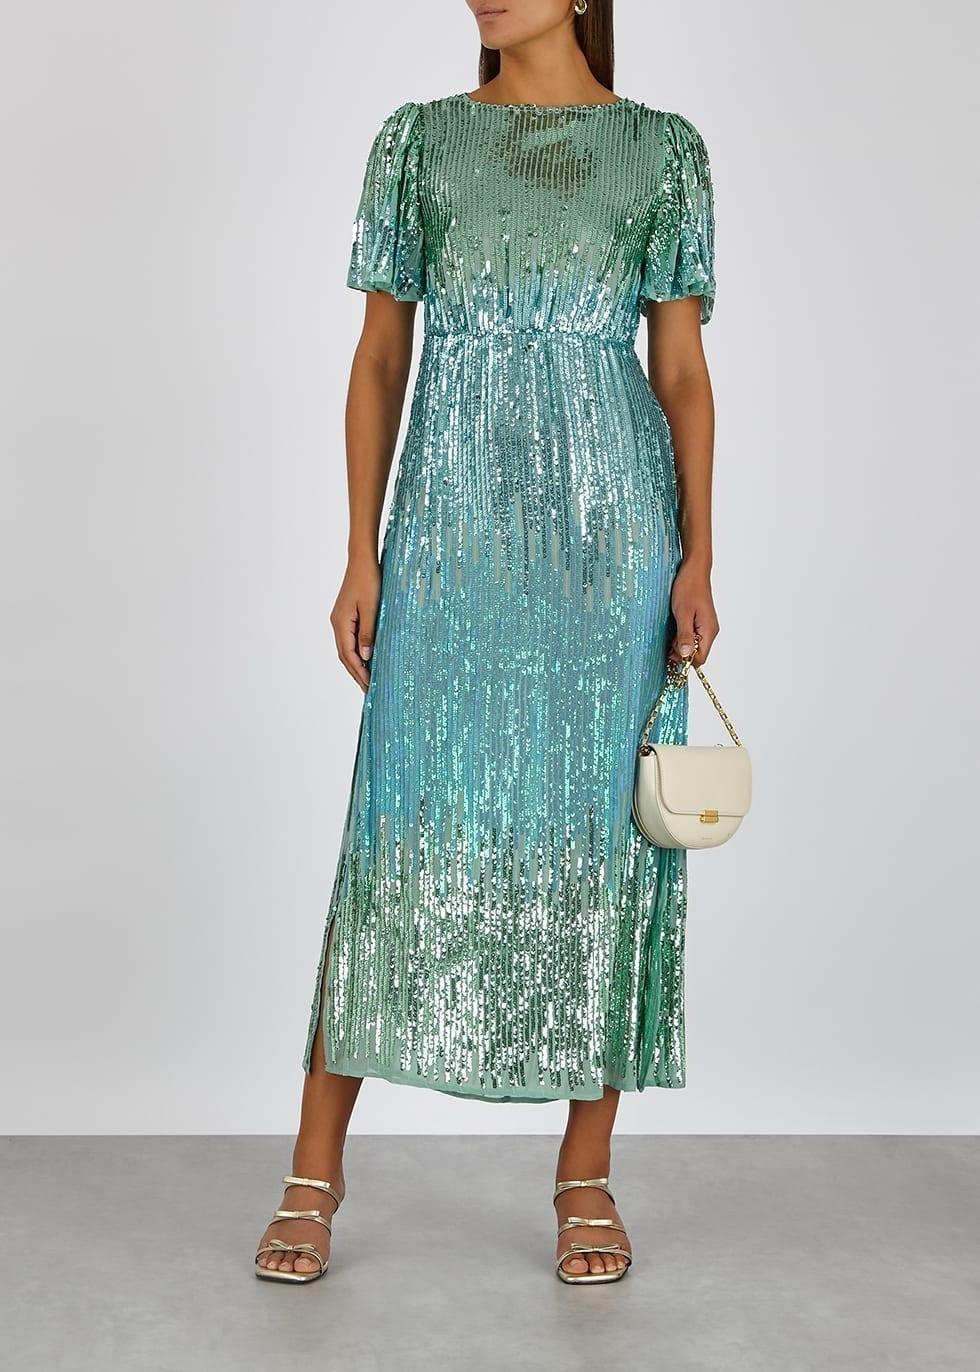 RIXO Venus Sequinned Chiffon Midi Dress